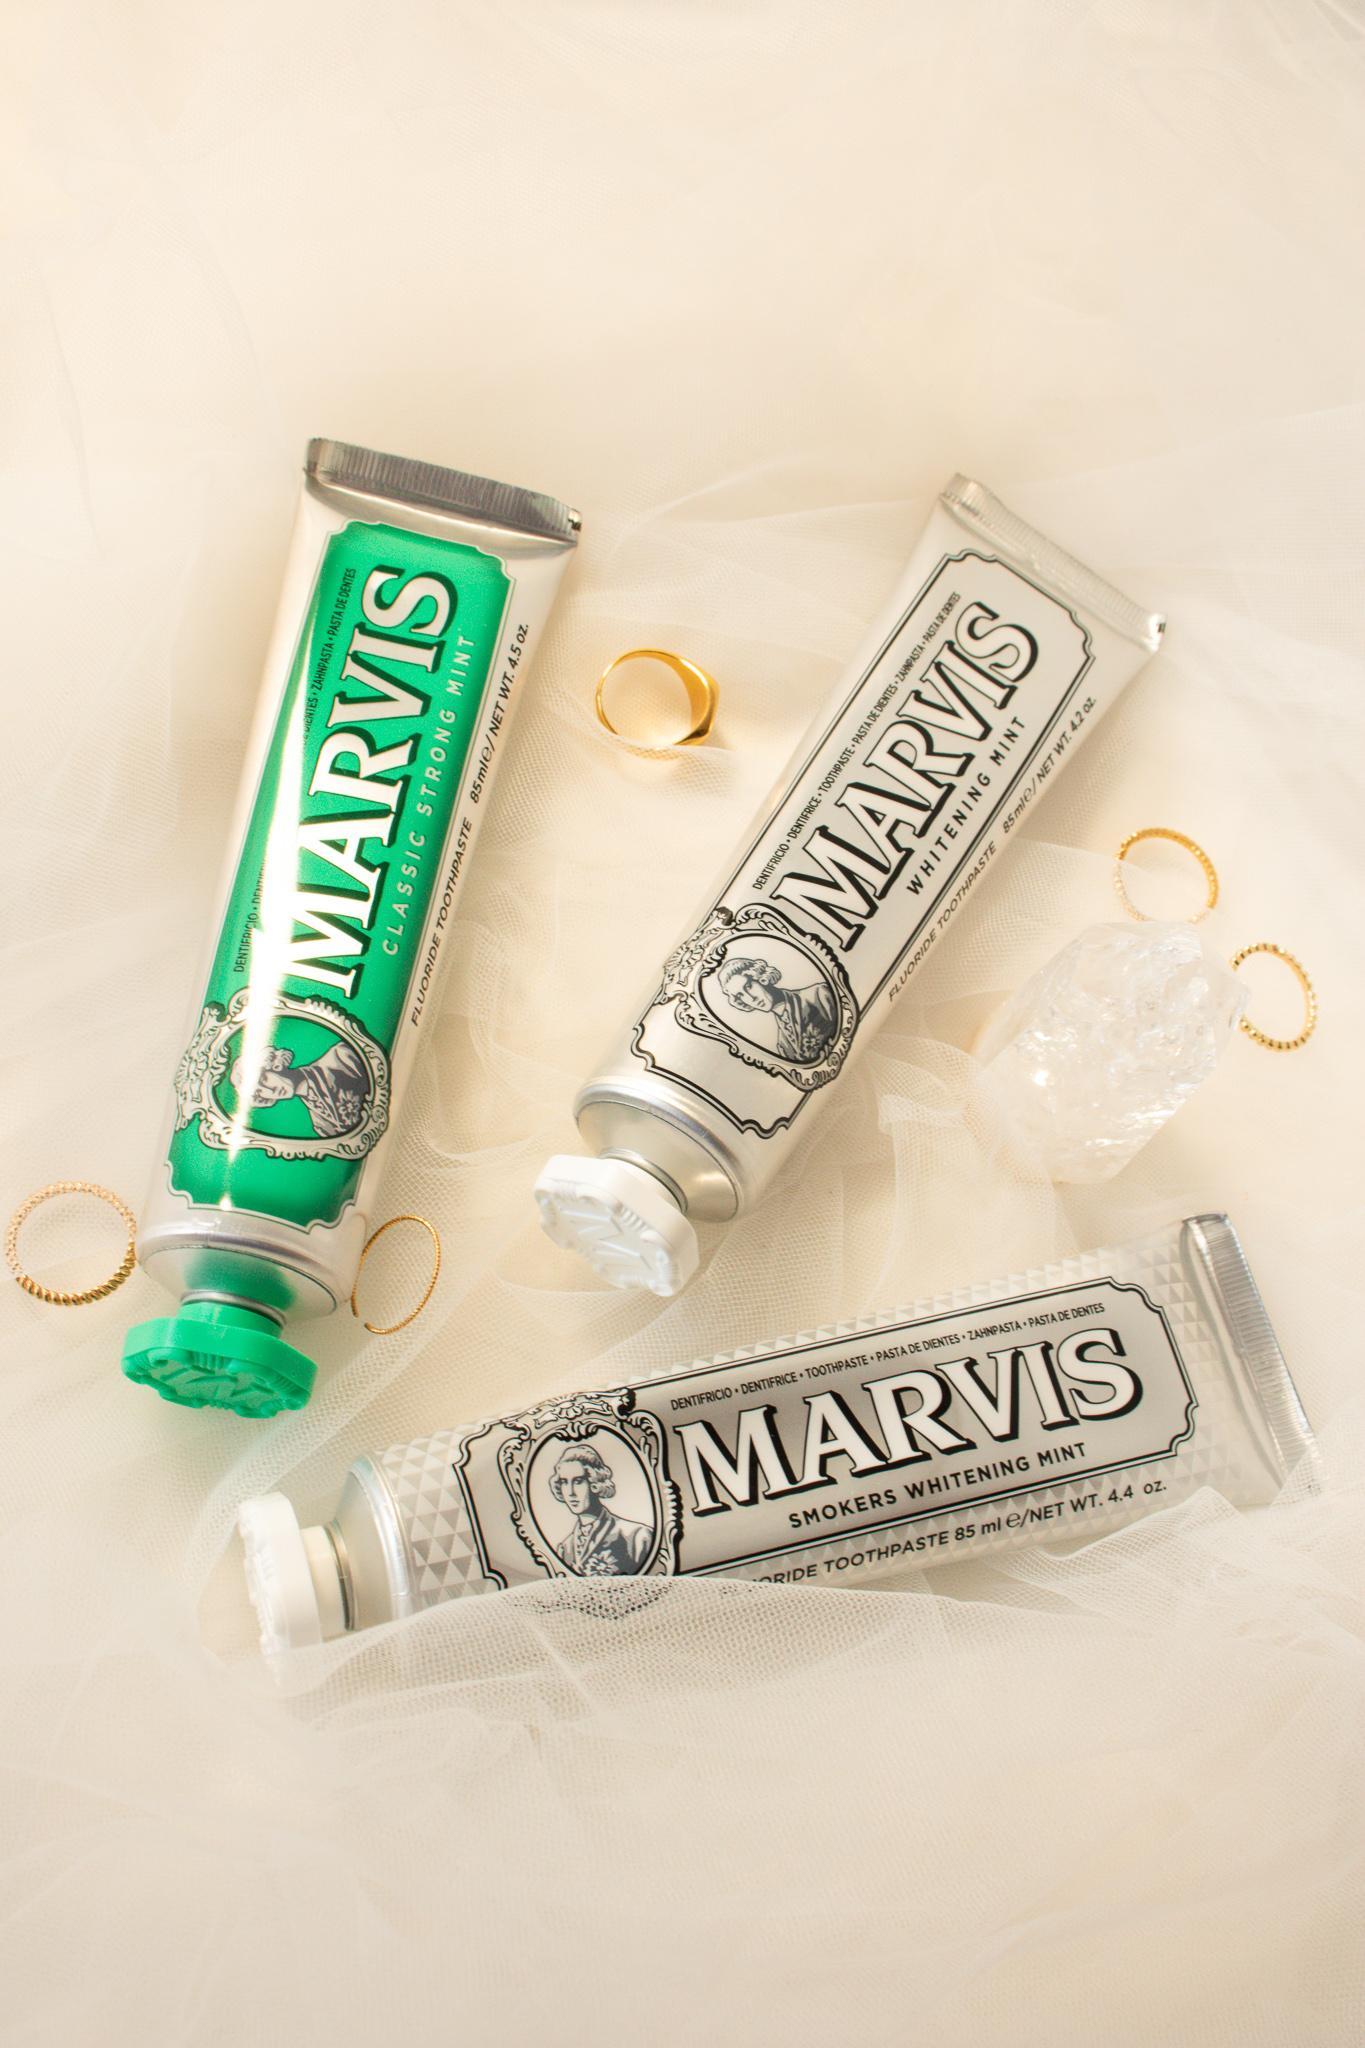 marvis tandpasta's